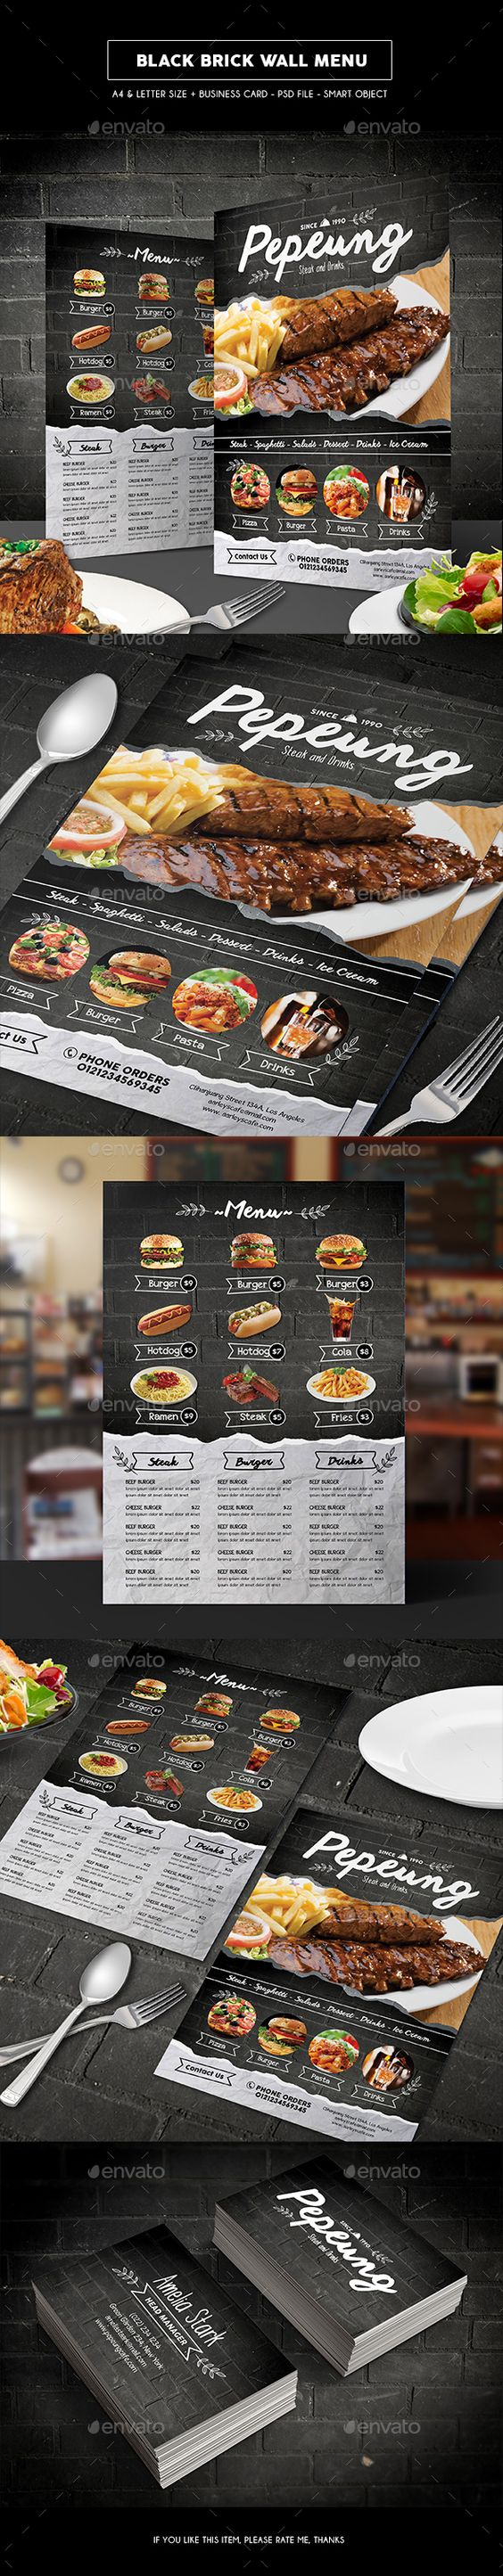 Black Brick Wall Menu Template PSD #design Download: http://graphicriver.net/item/black-brick-wall-menu/13631337?ref=ksioks